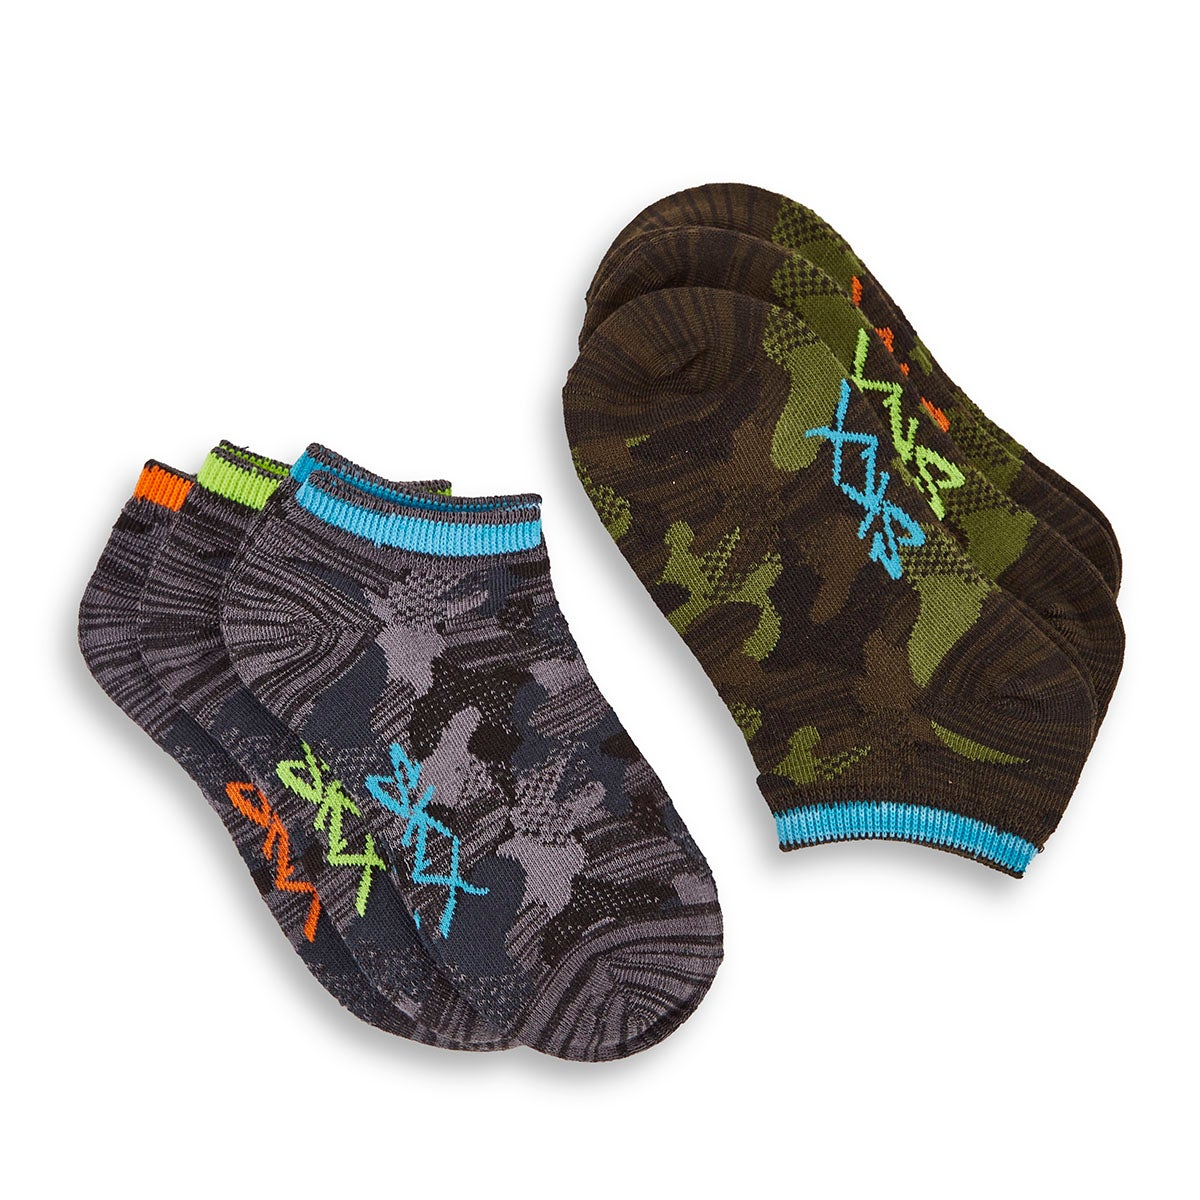 Boys' NON TERRY LOW CUT multi socks - 6pk